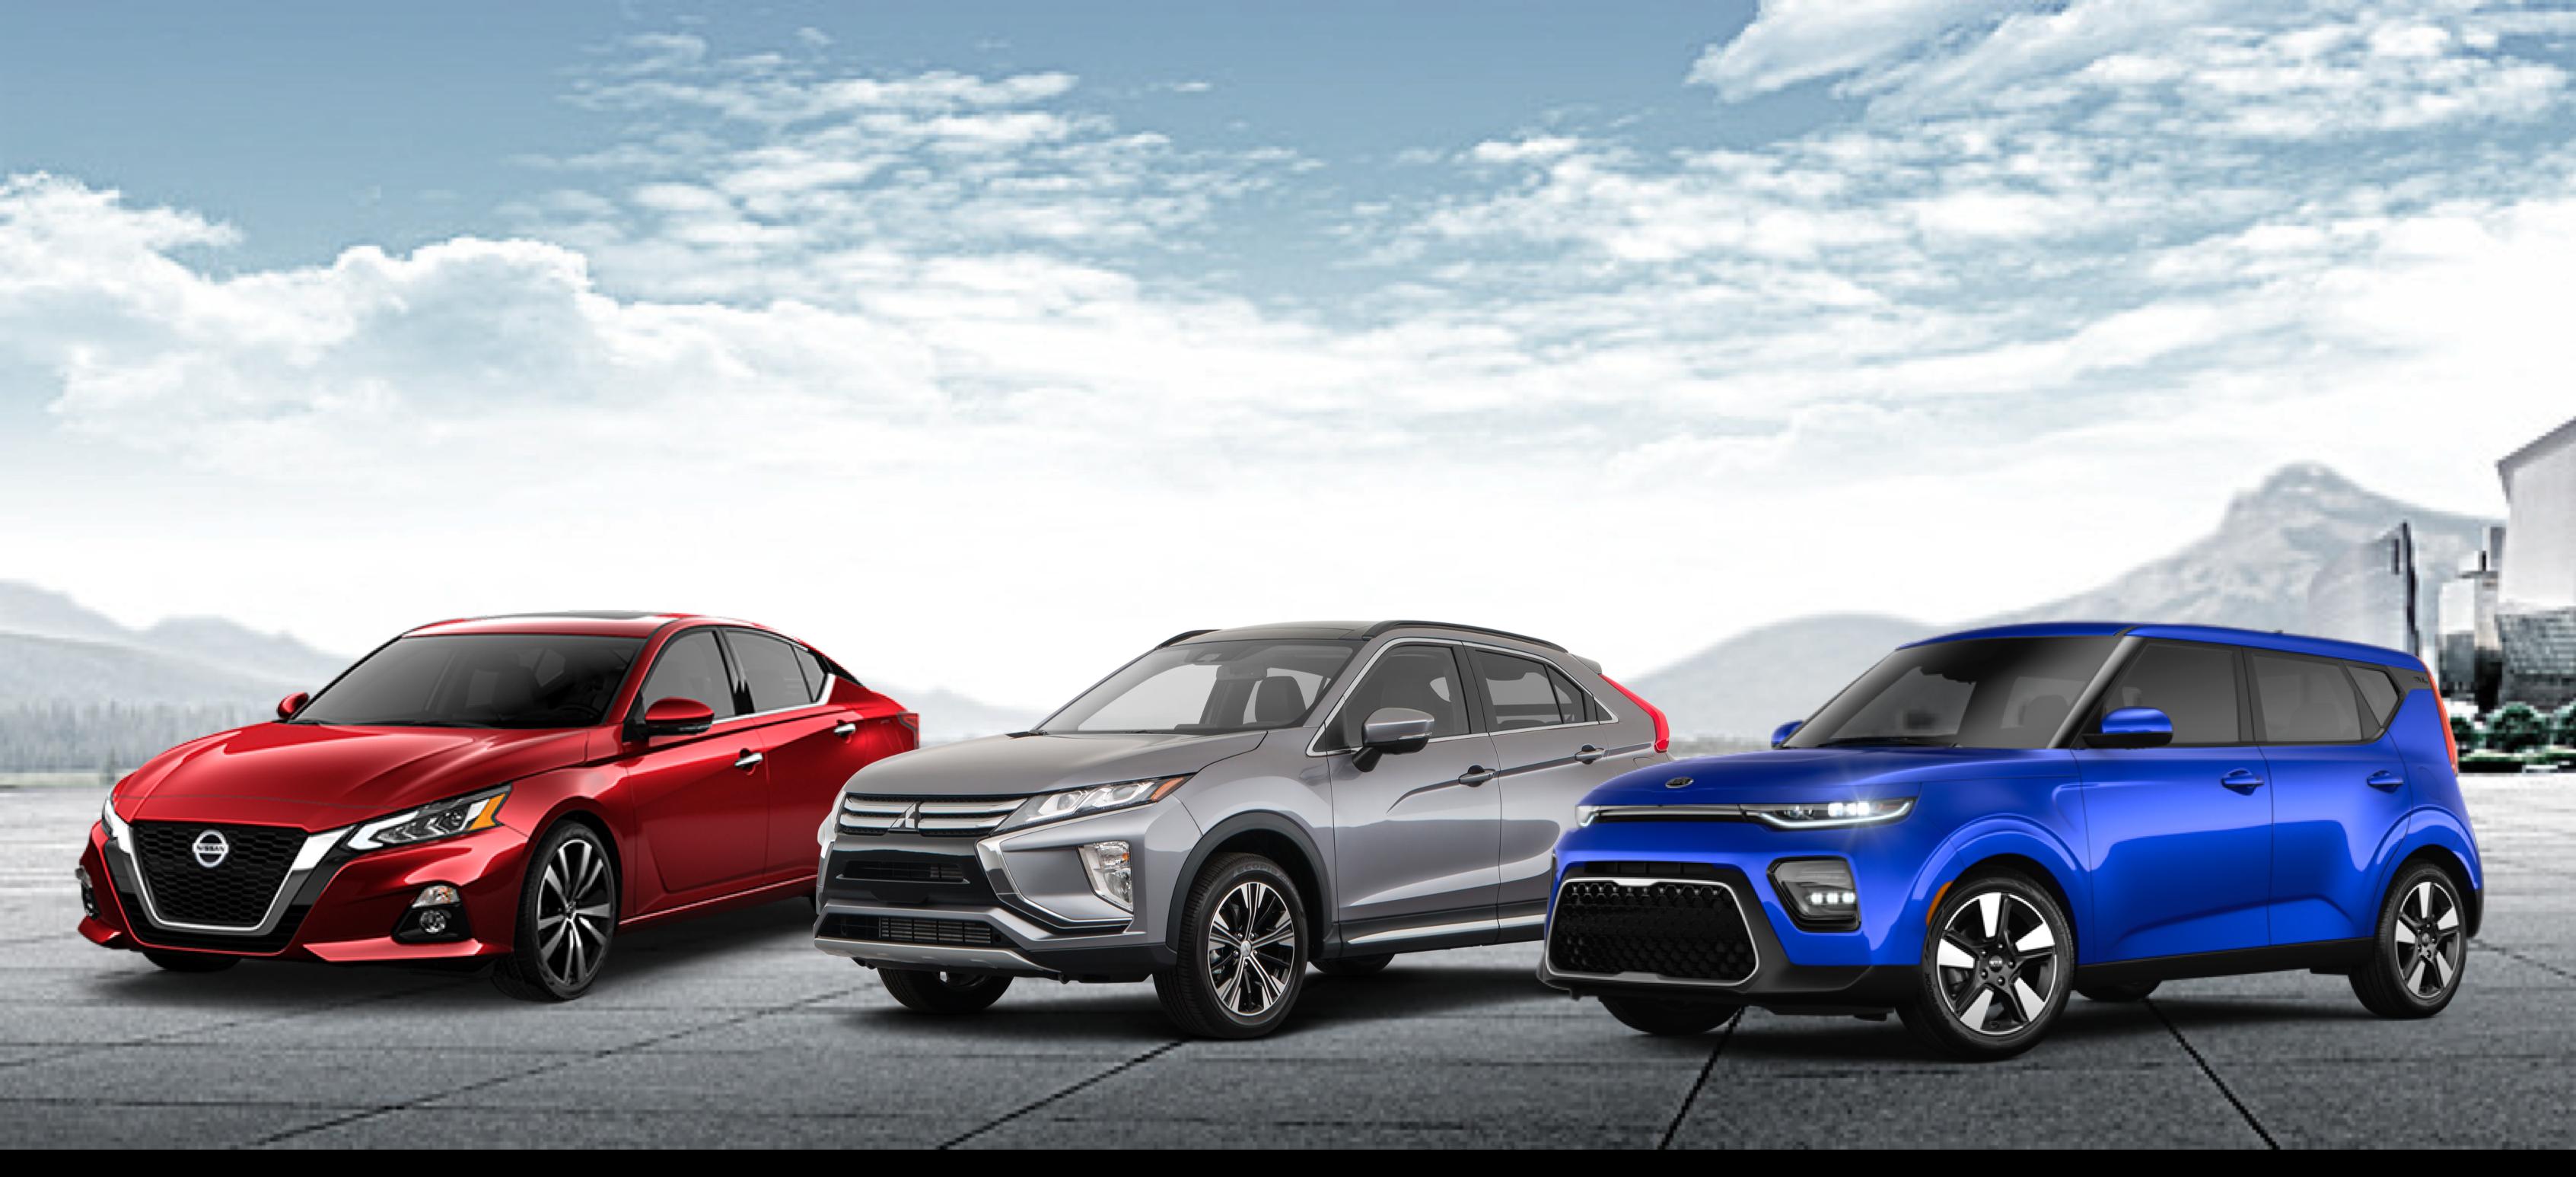 New 2020 Cars